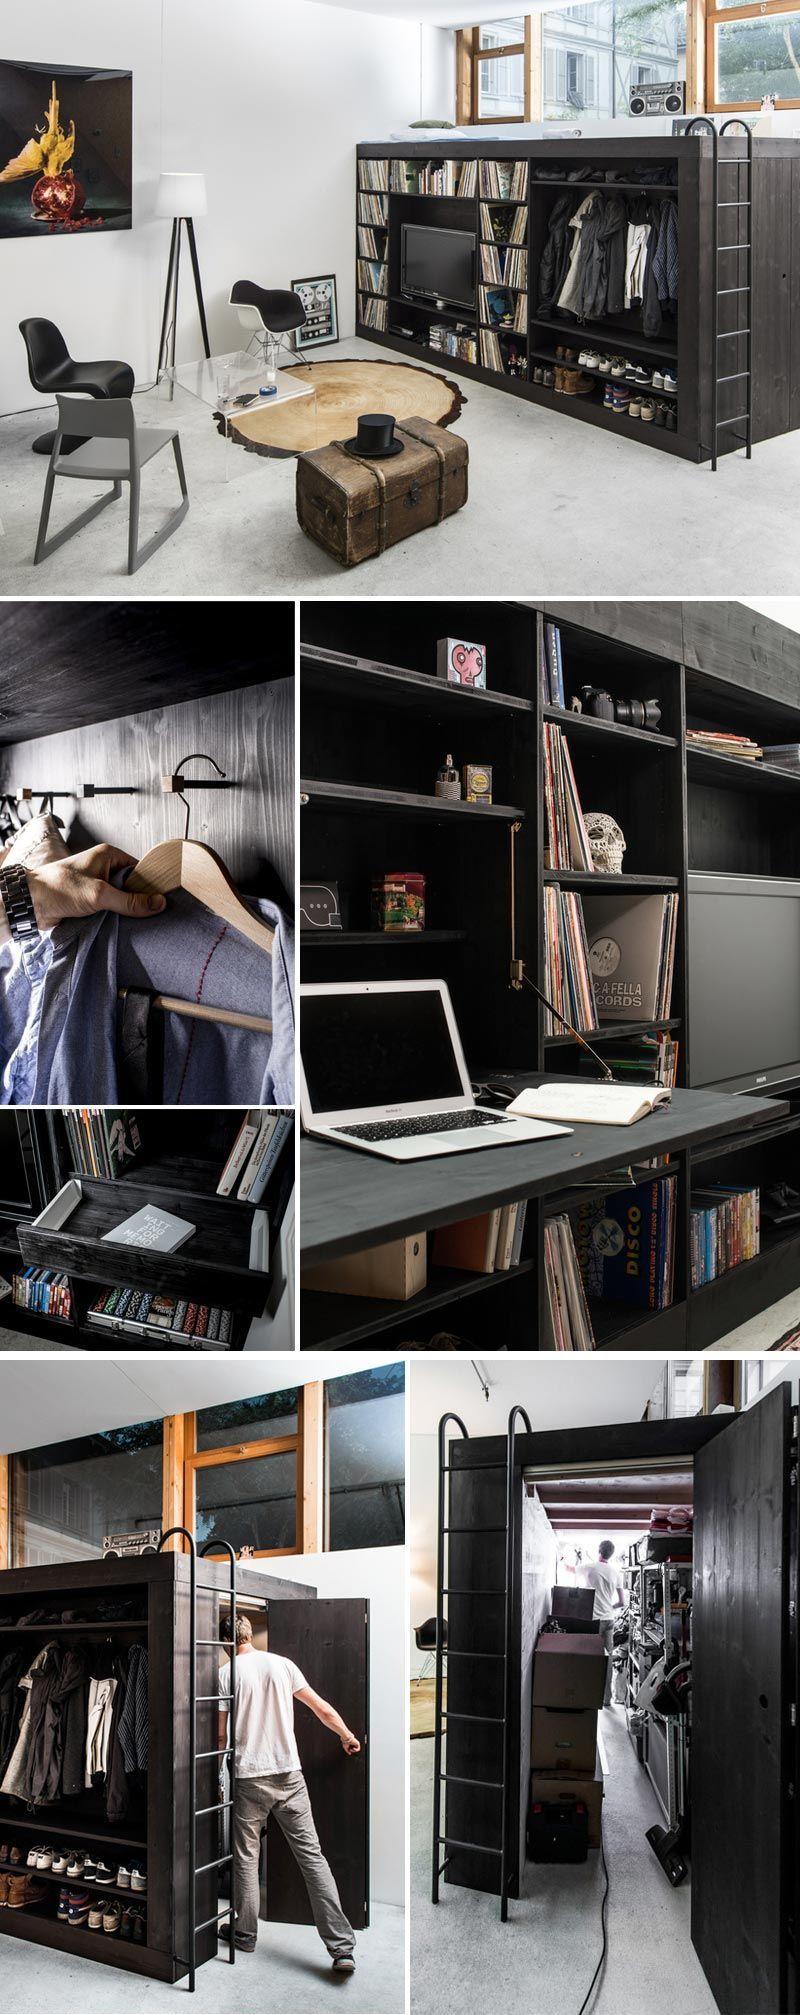 stylish multitasking studio in smallspace living small house